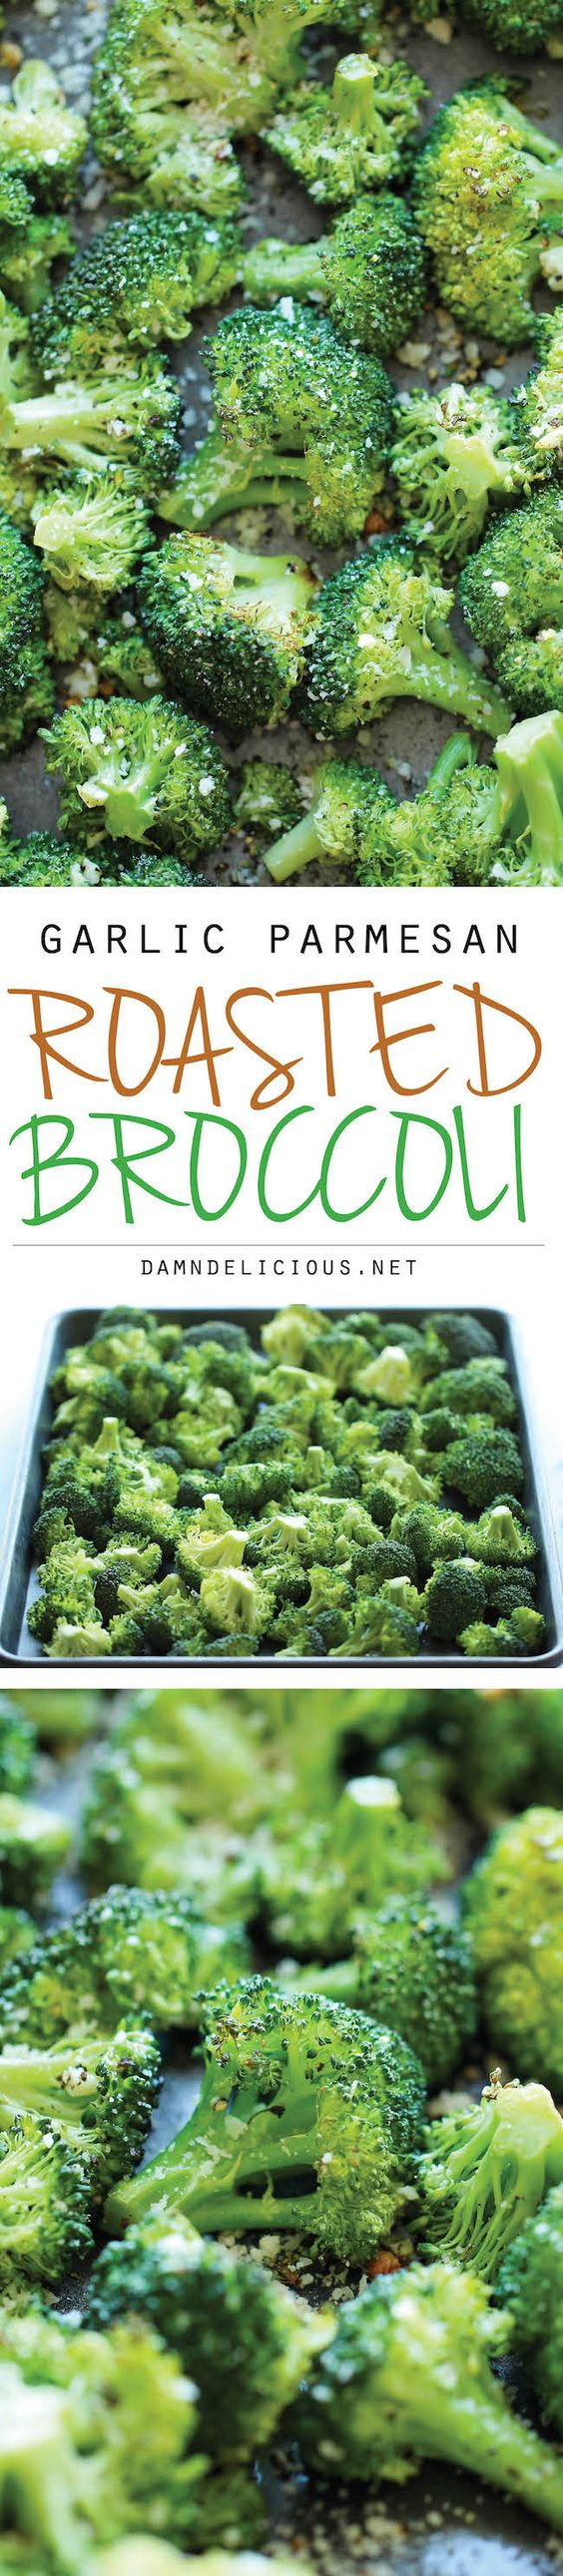 Garlic Parmesan Roasted Broccoli.